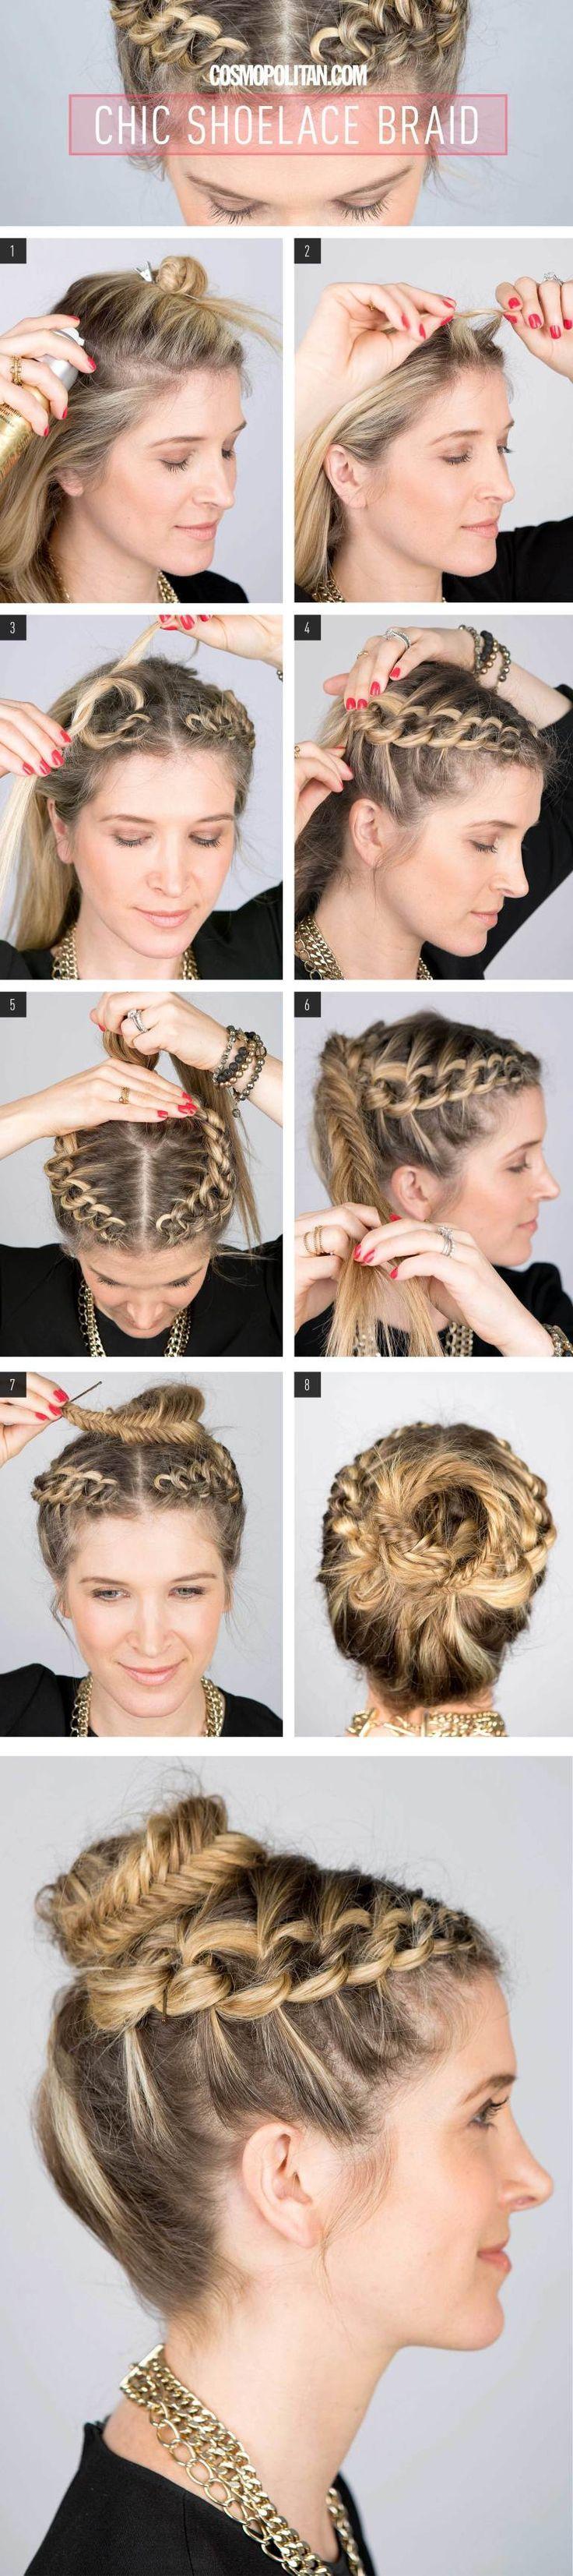 Pretty Braided Crown Hairstyle Tutorials and Ideas / http://www.himisspuff.com/easy-diy-braided-hairstyles-tutorials/20/